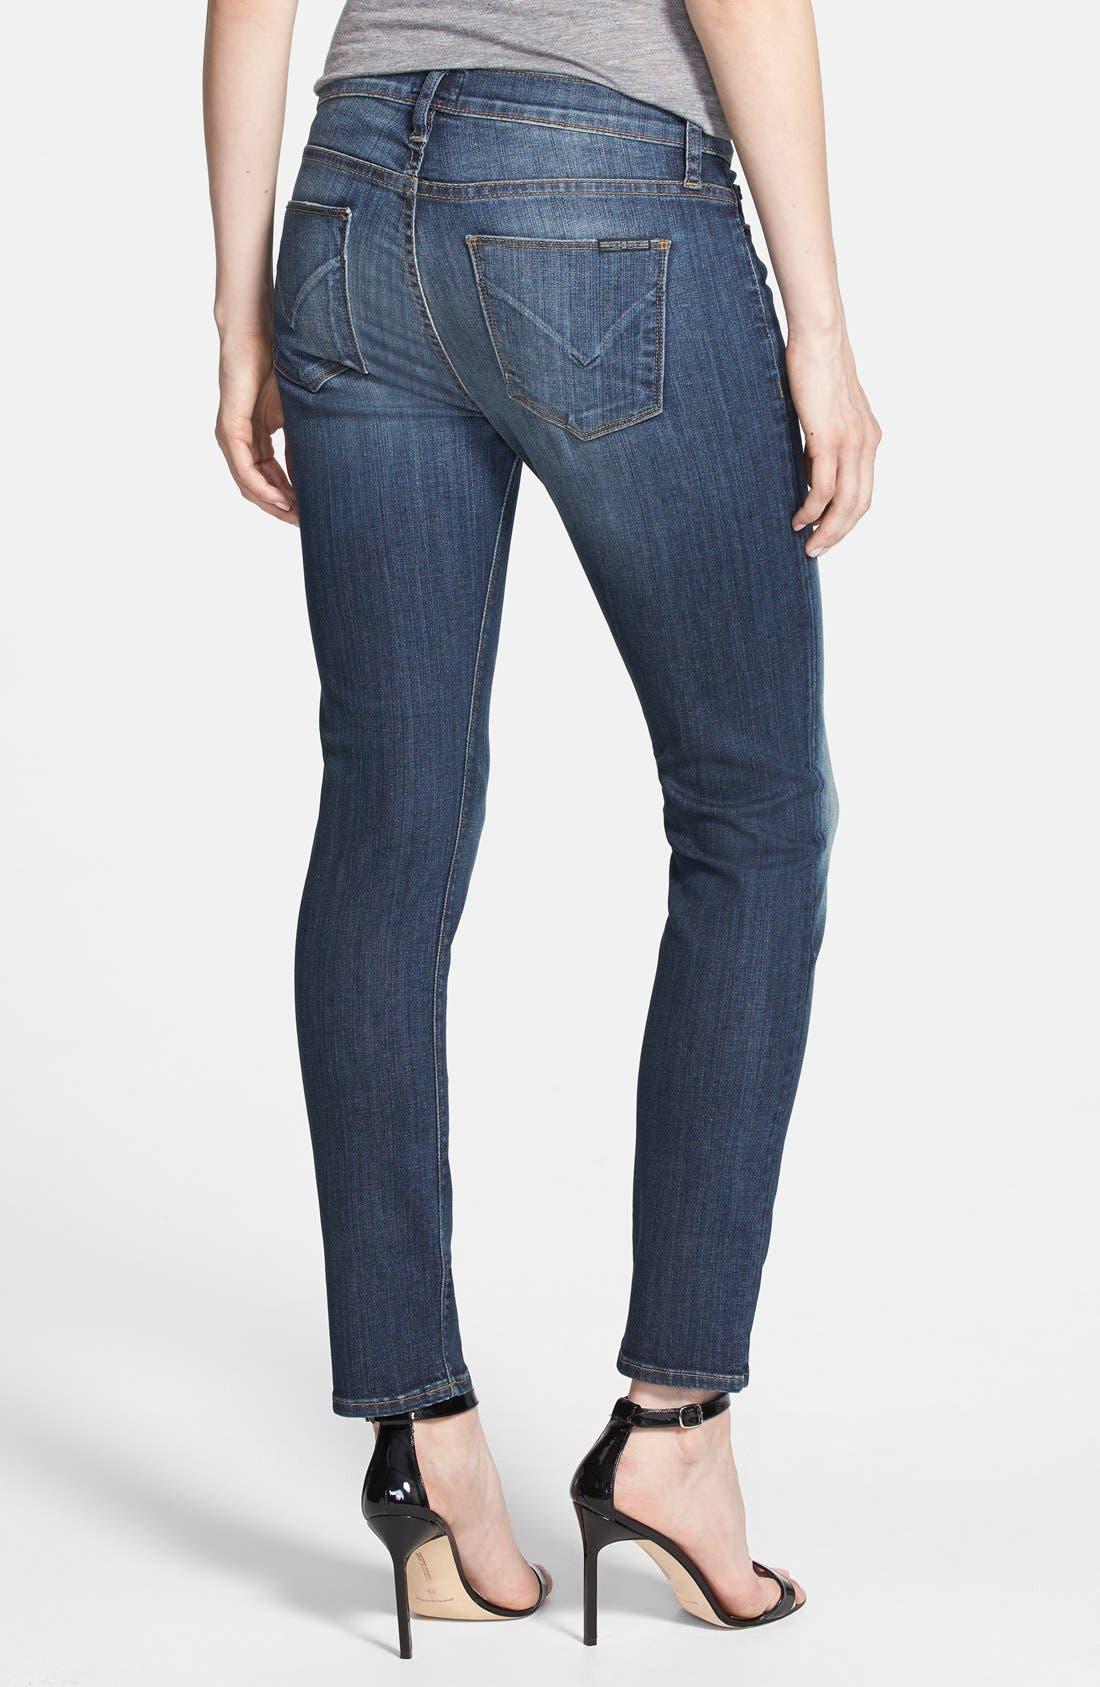 Alternate Image 2  - Hudson Jeans 'Collette' Skinny Ankle Jeans (Glam)